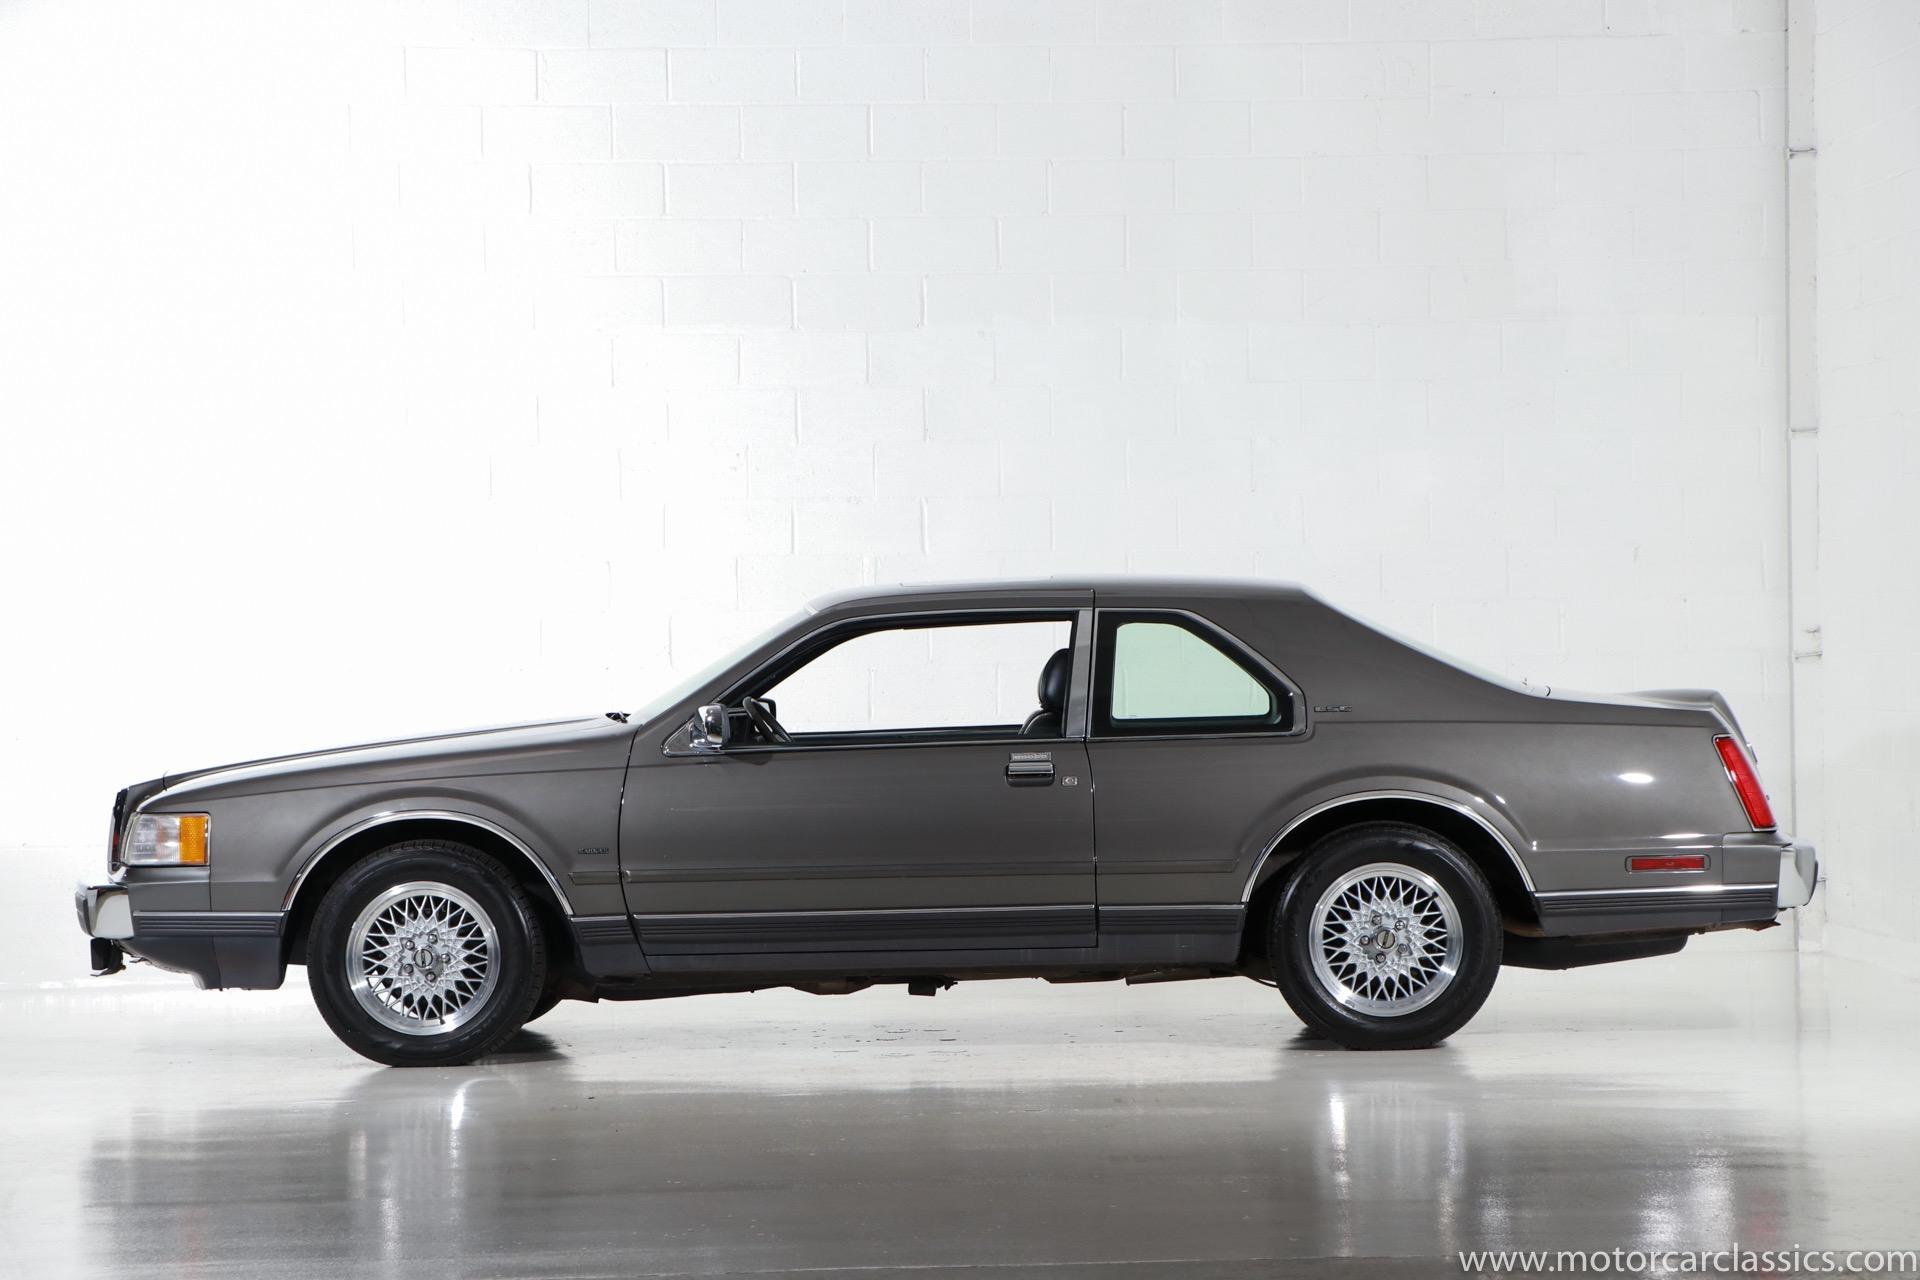 1989 Lincoln Mark VII LSC